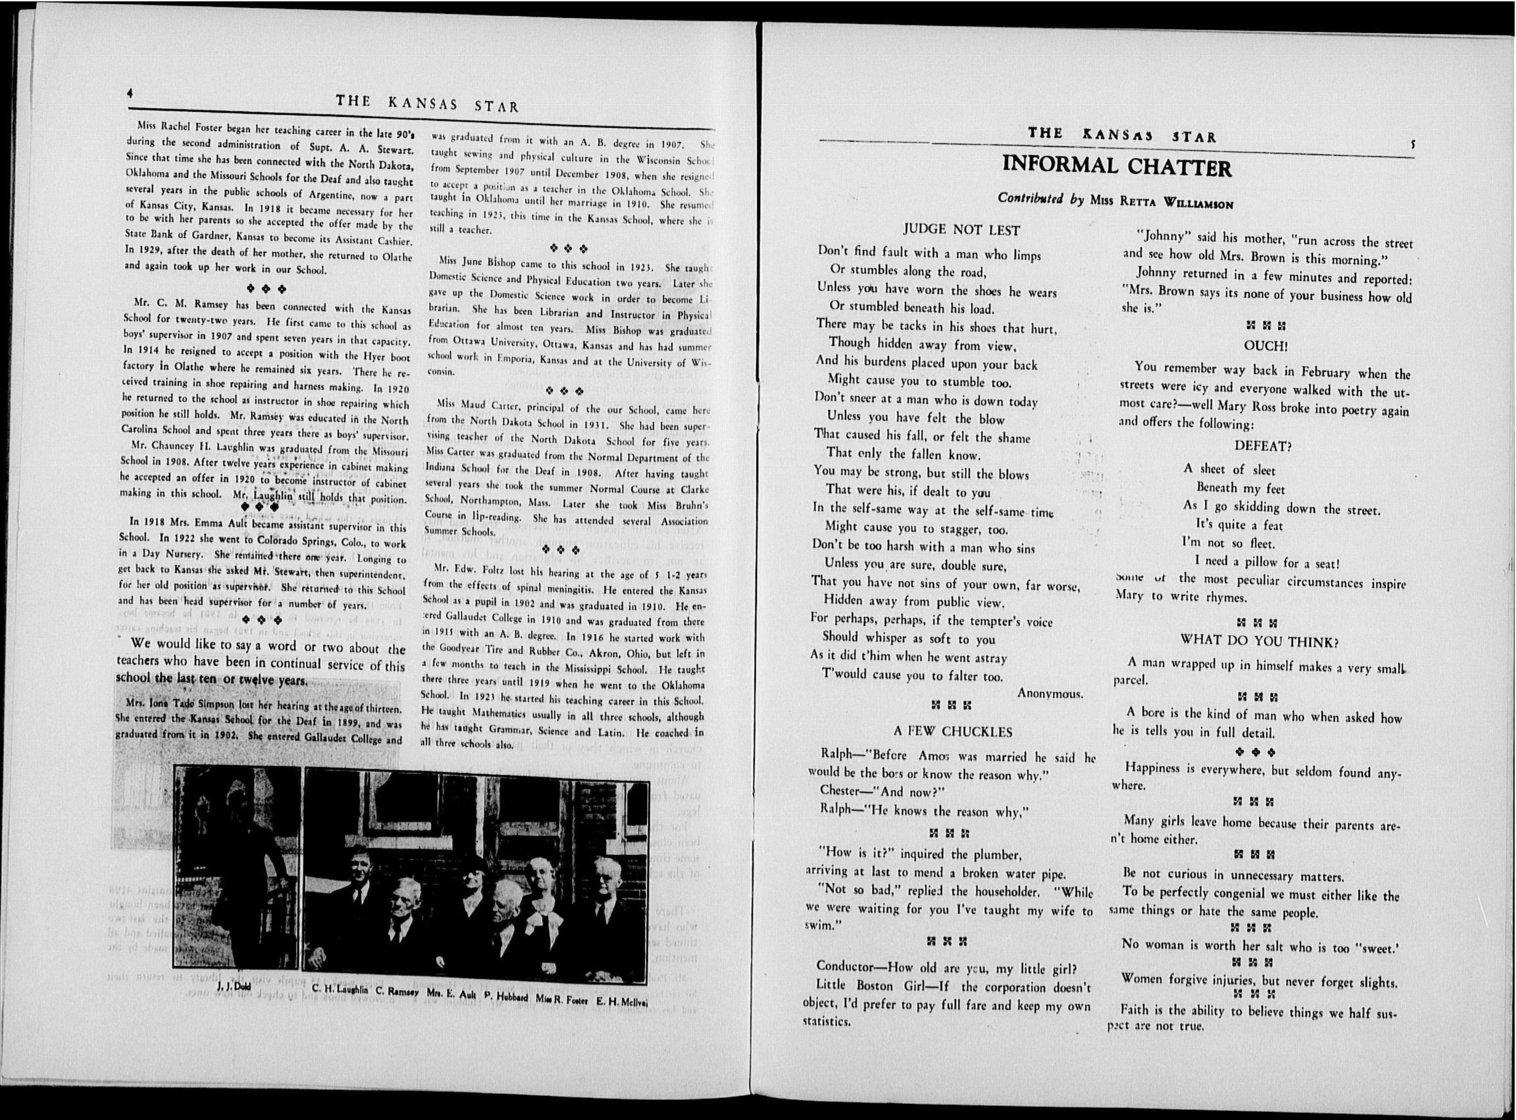 The Kansas Star, volume 50, number 5 - 4-5